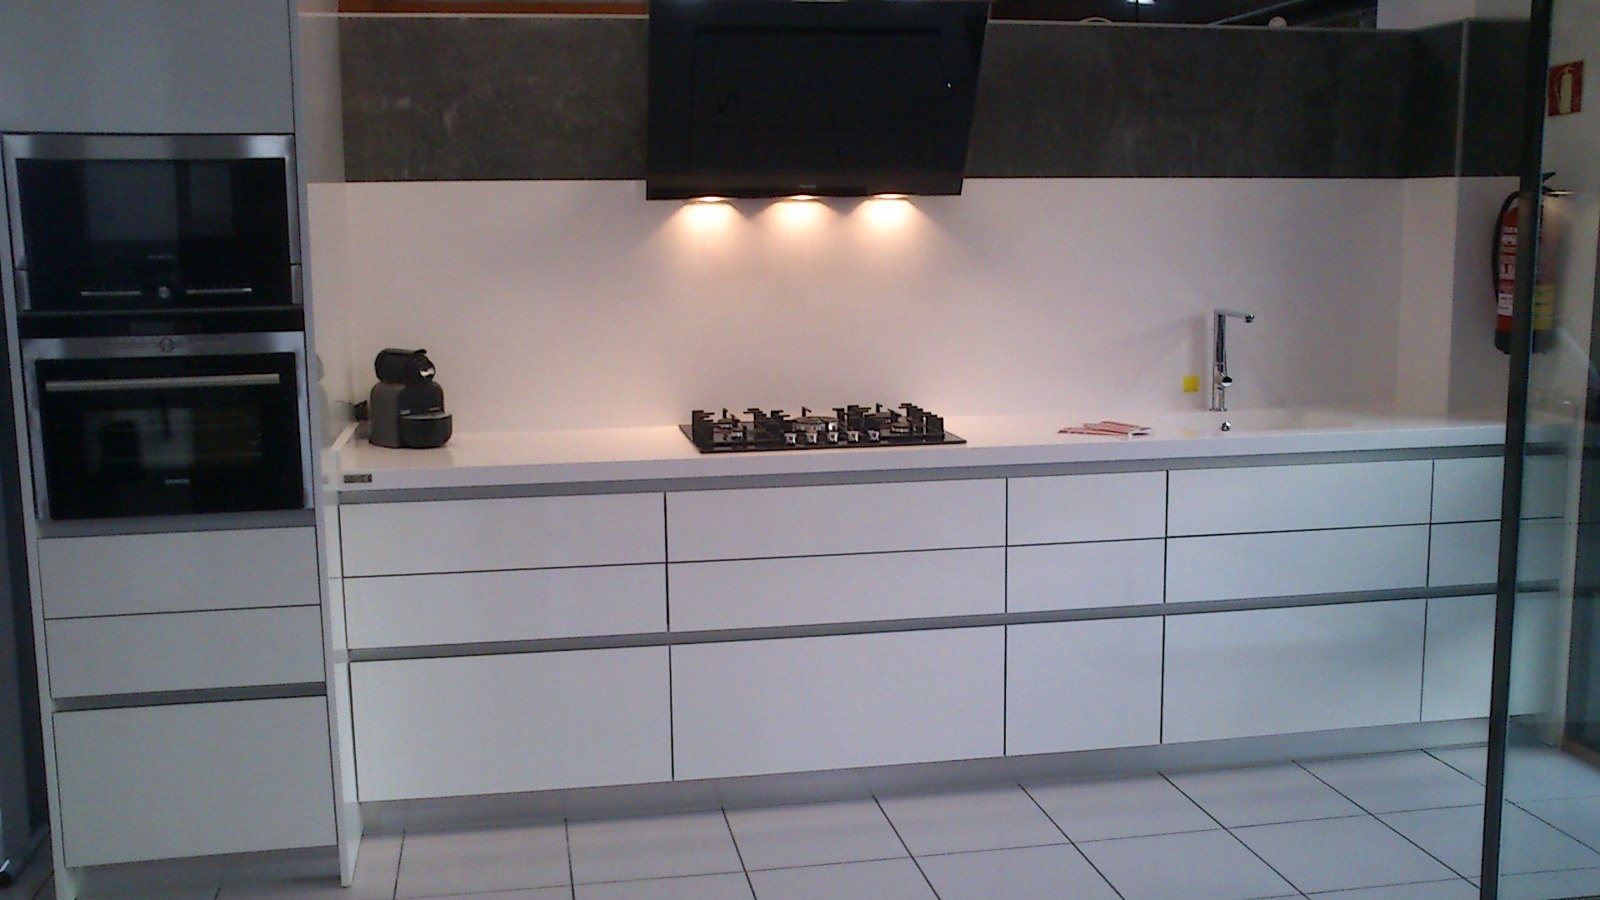 Foto cocina exposici n de rm reformes i materials 240747 habitissimo - Cocinas exposicion ocasion ...